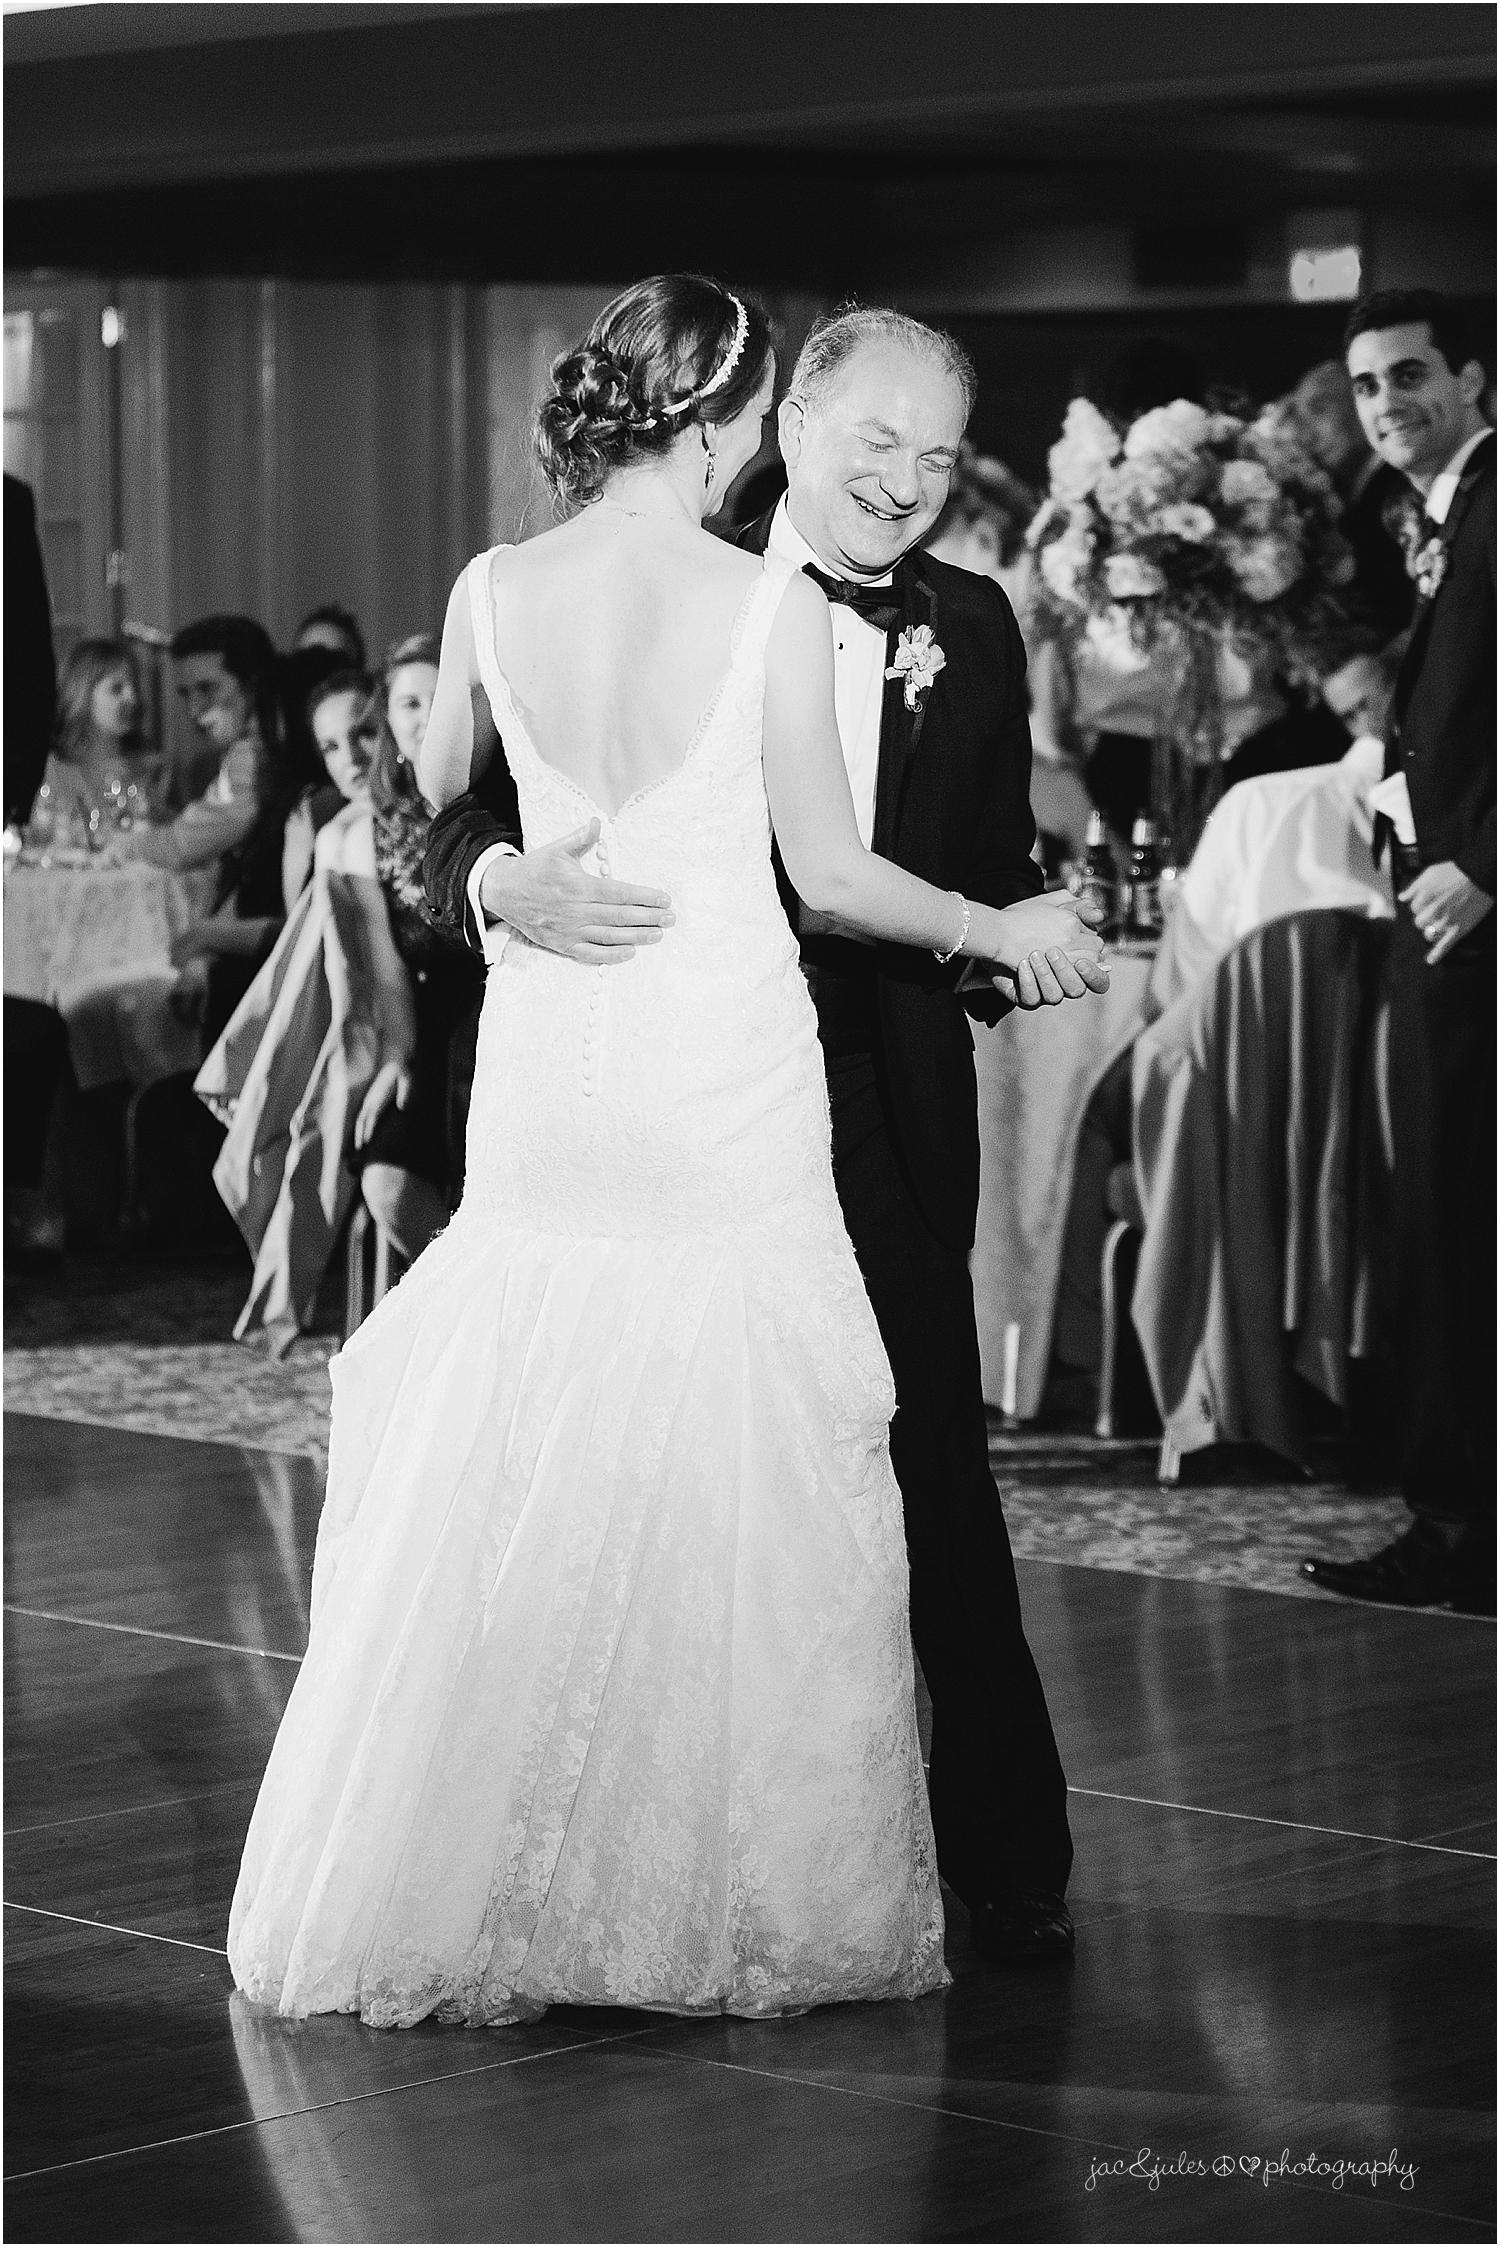 jacnjules photographs wedding reception at olde mill inn in basking ridge nj